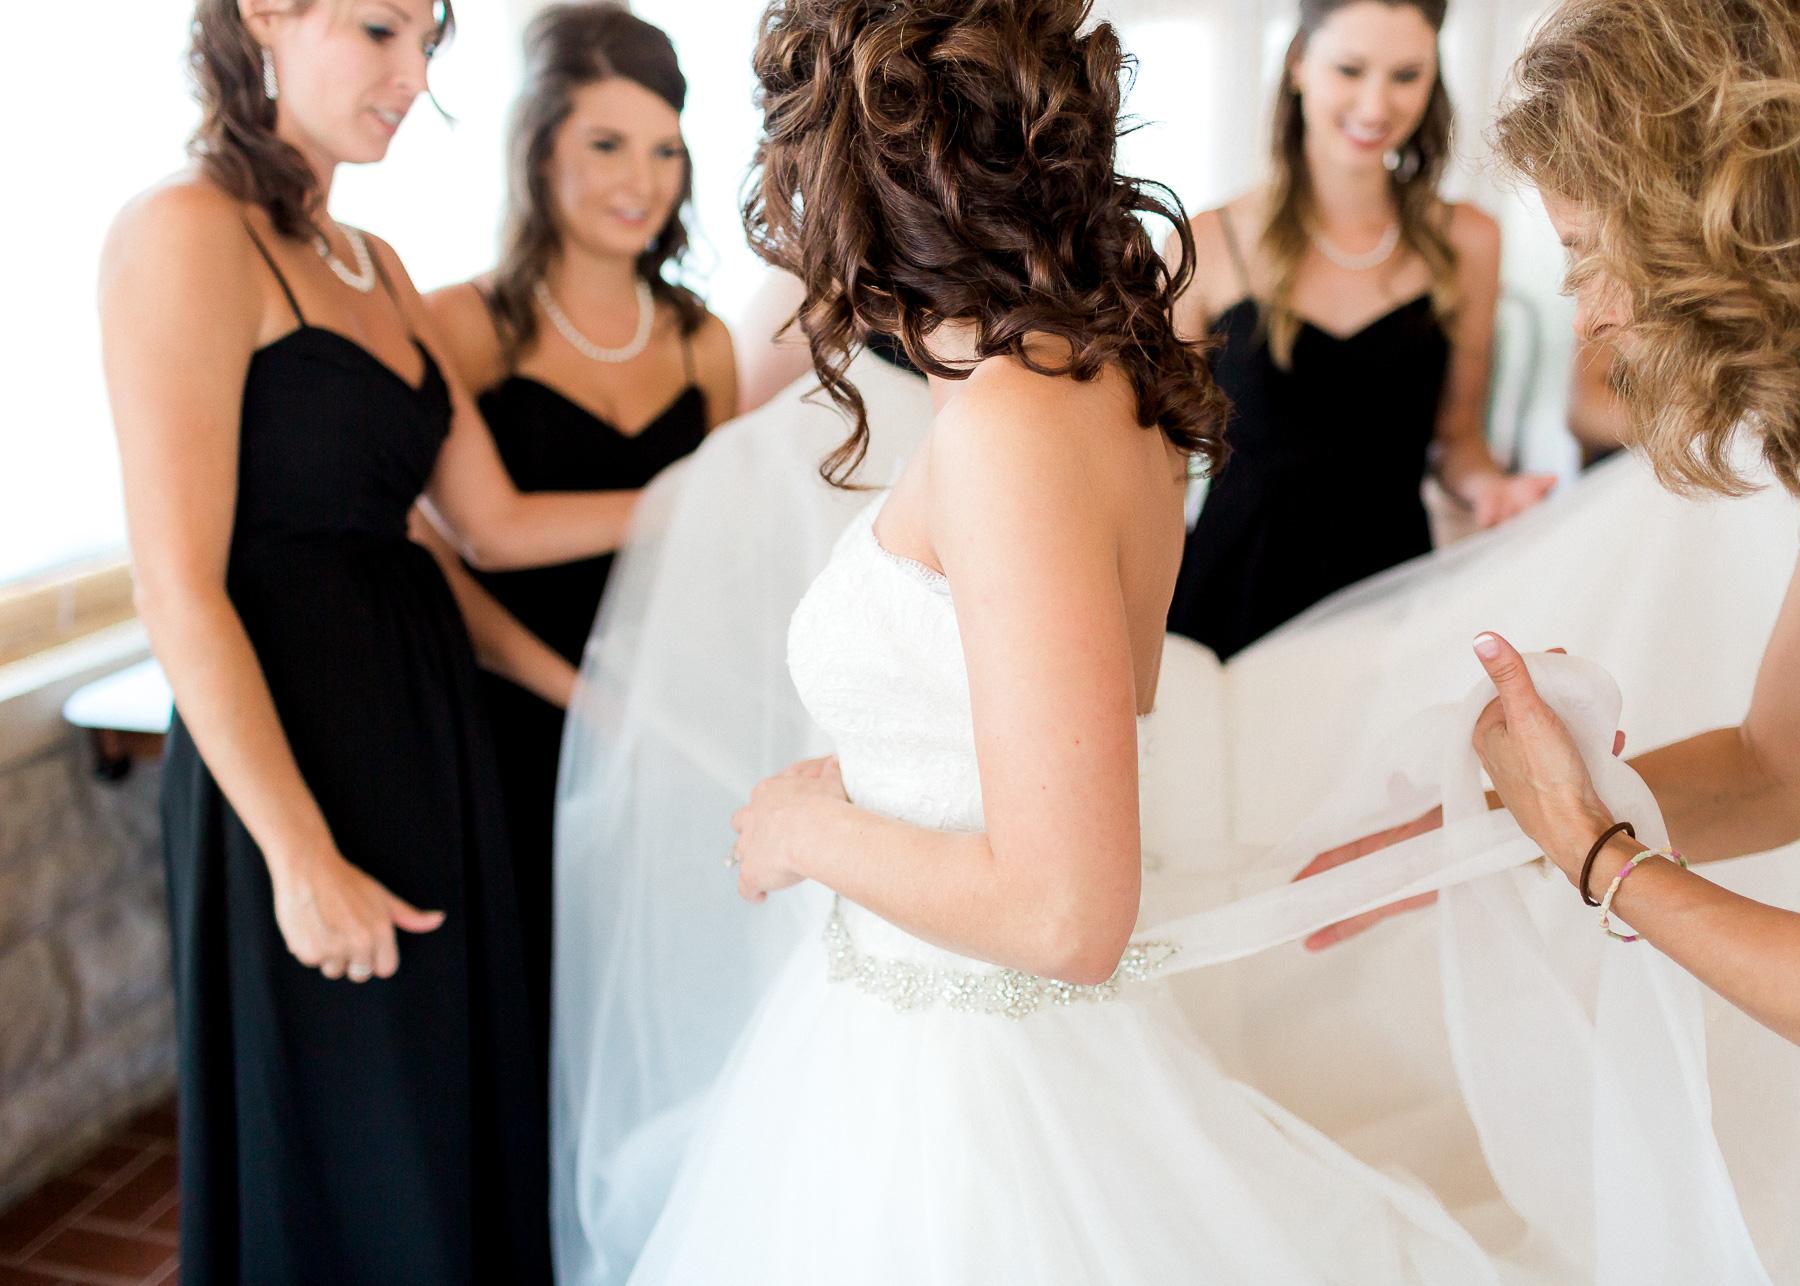 tying bow on wedding dress